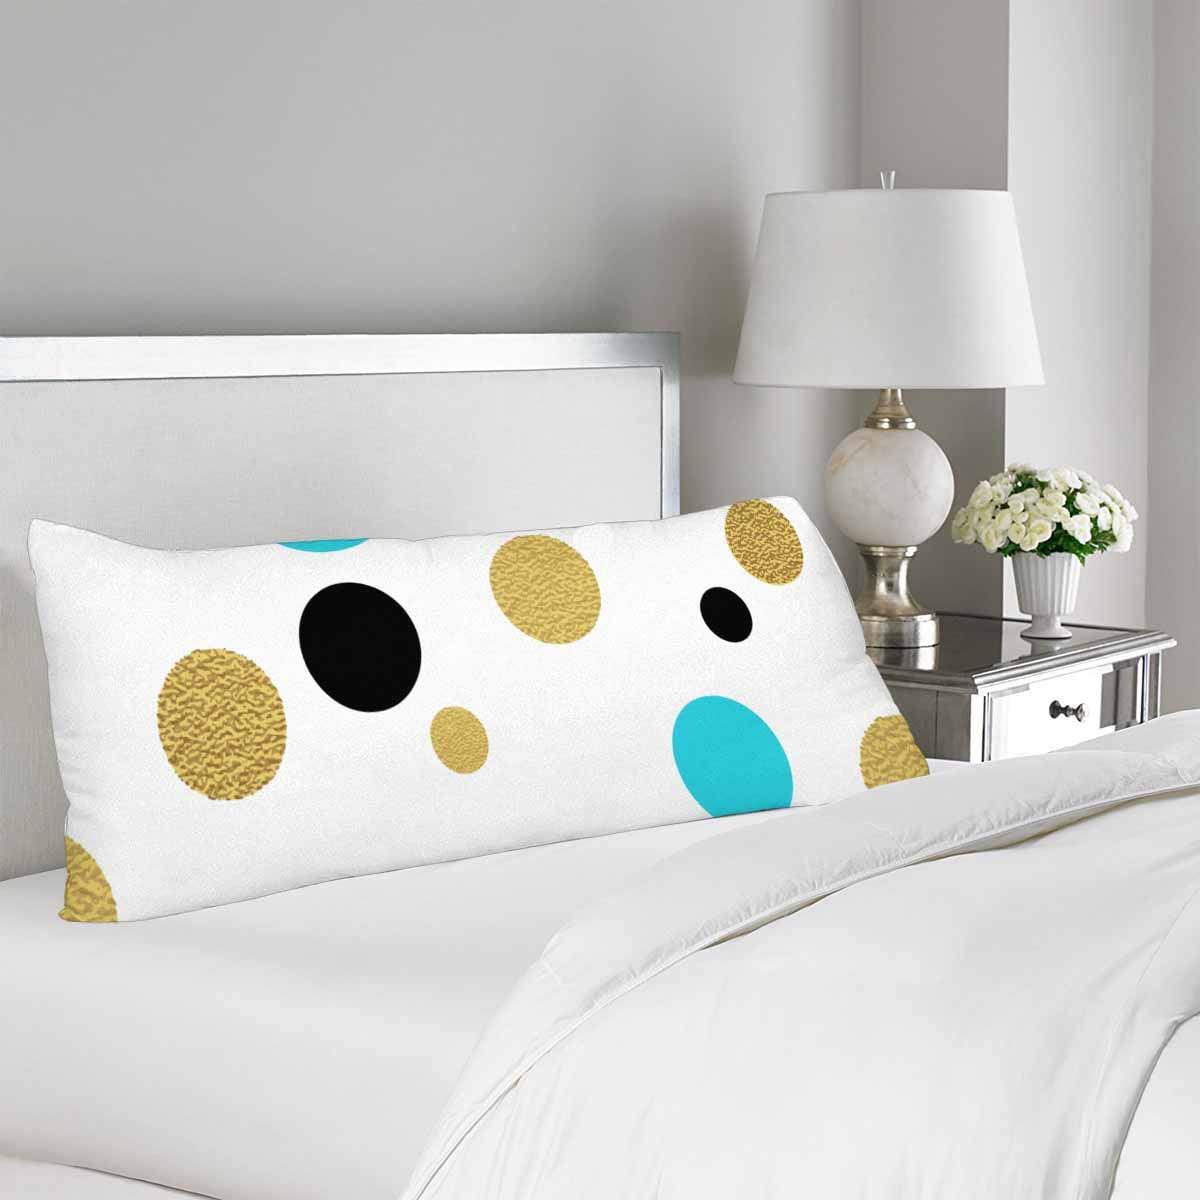 GCKG Gold Glitter Polka Dot Pillow Covers Pillowcase Zipper 20x60 inches, Classic Dotted Body Pillow Case Protector - image 1 de 2